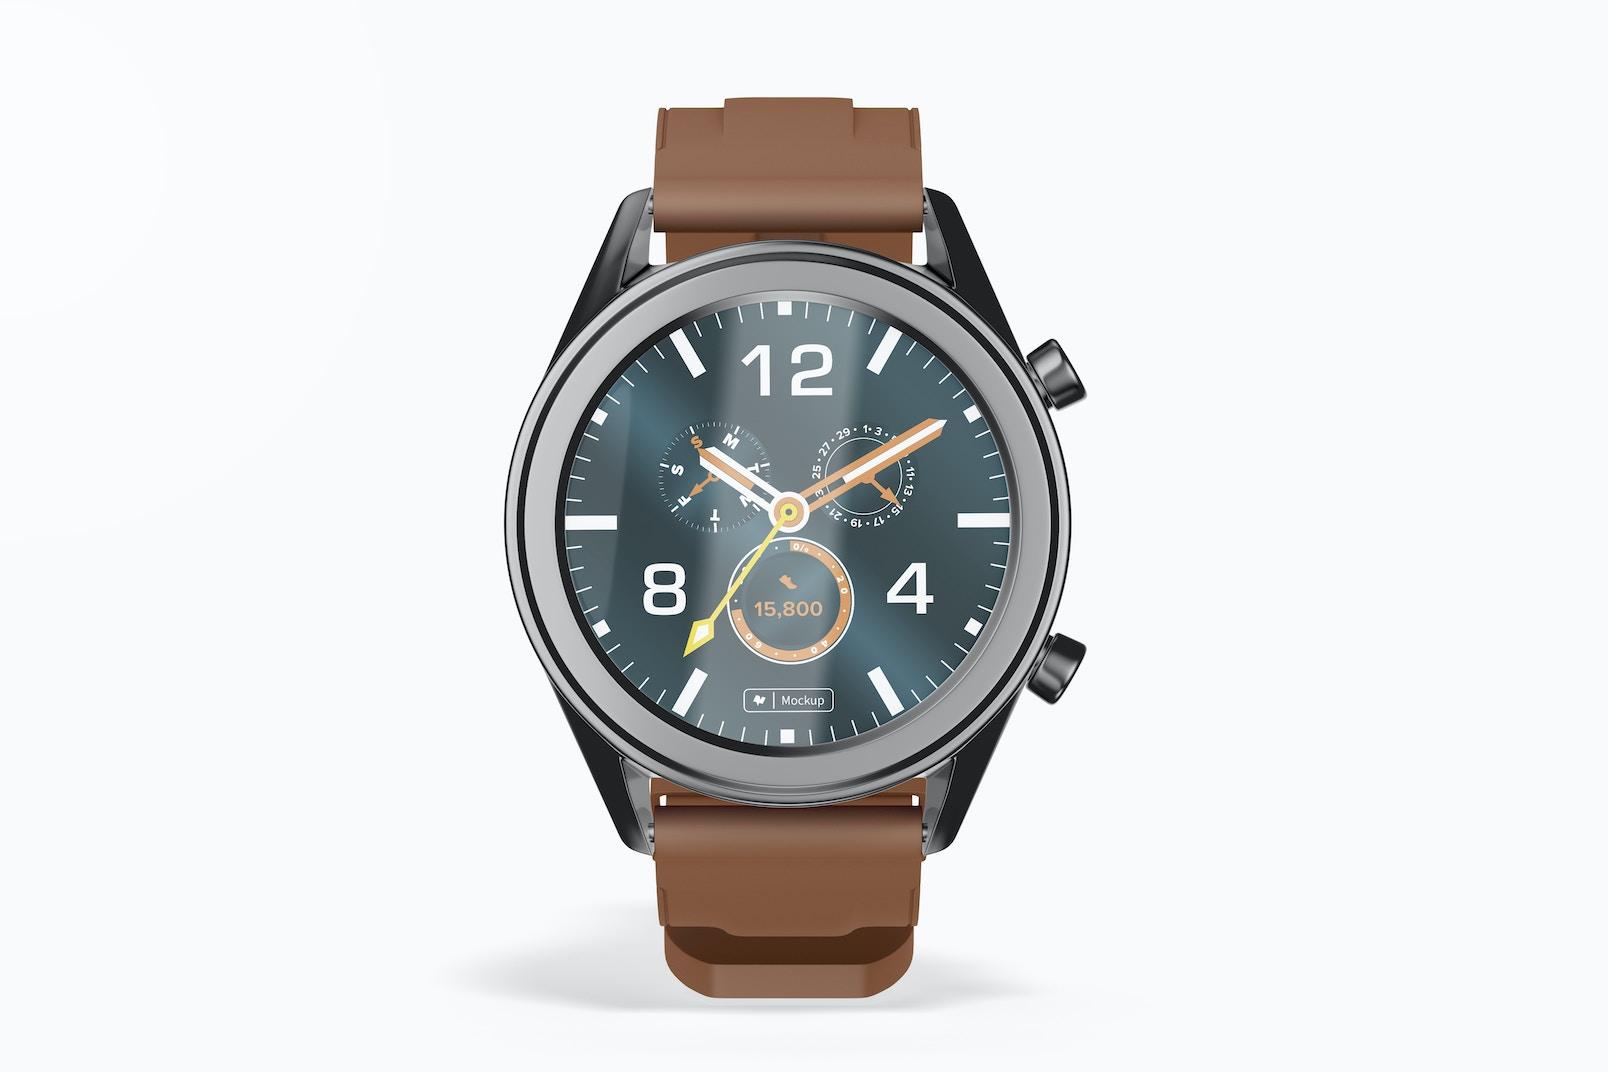 Huawei Watch GT Smartwatch Mockup, Front View